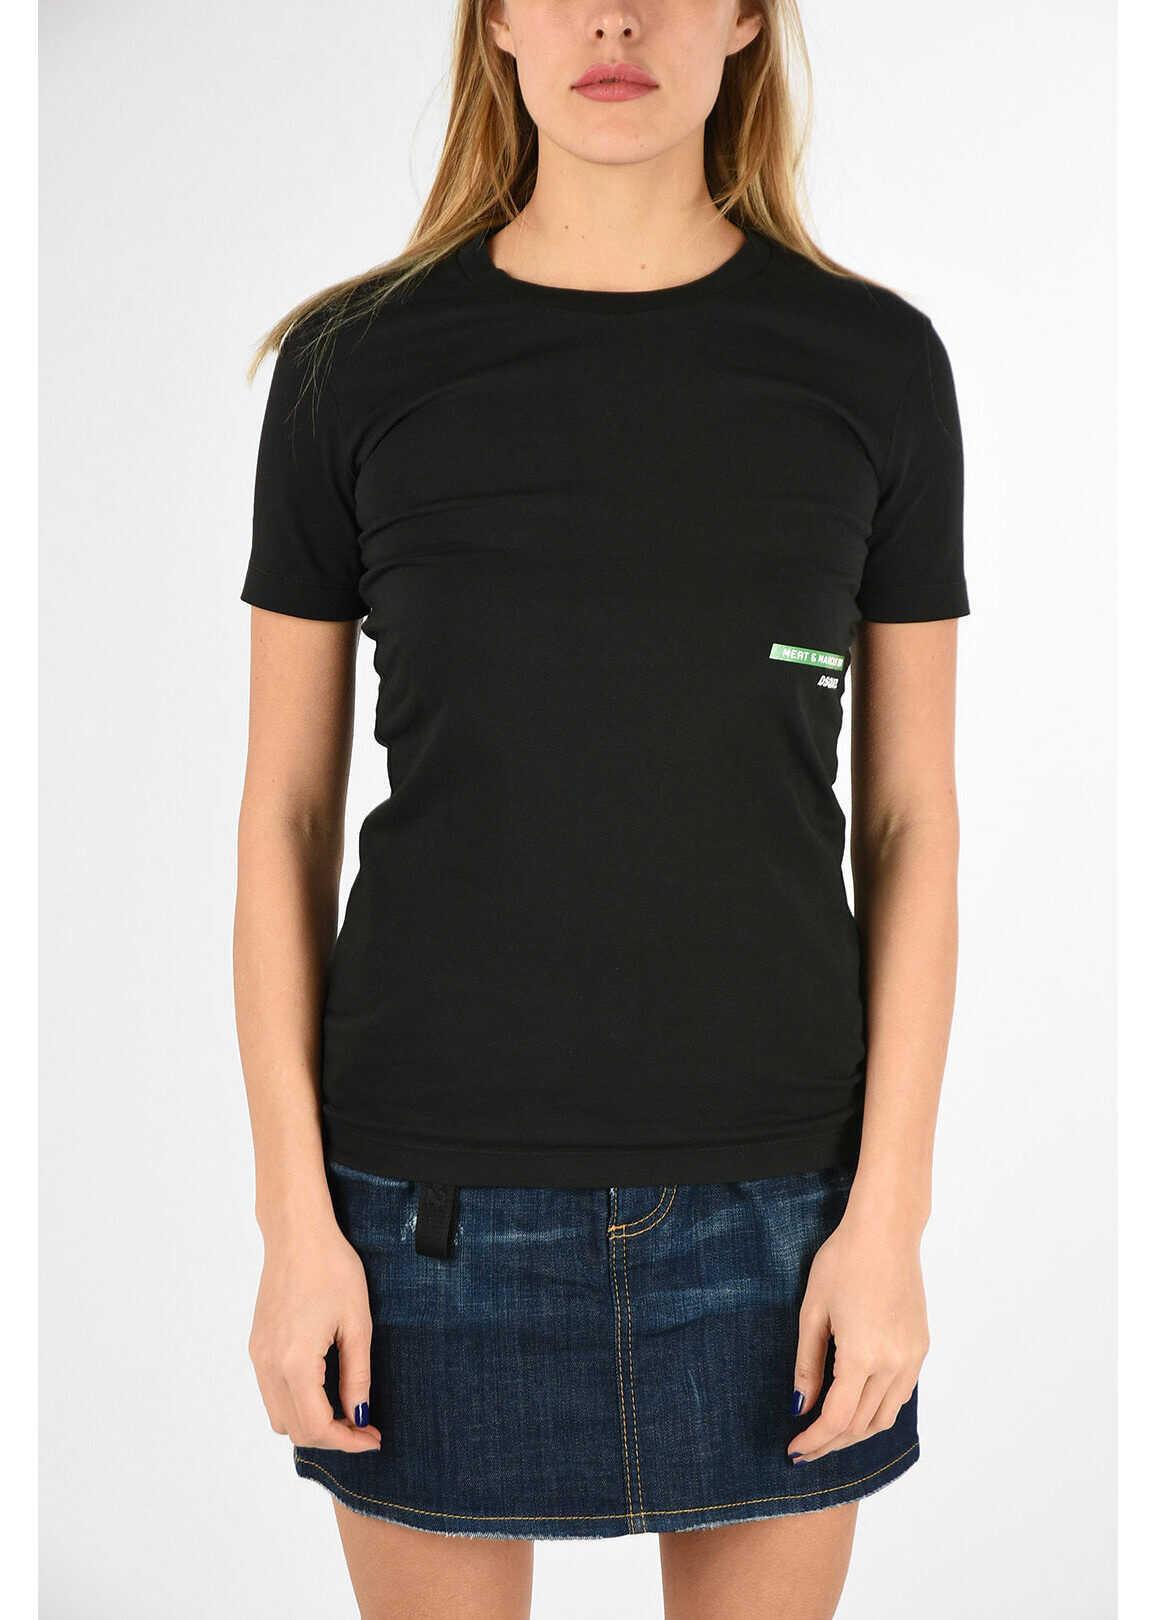 DSQUARED2 MERT&MARCUS Printed Crewneck T-shirt BLACK